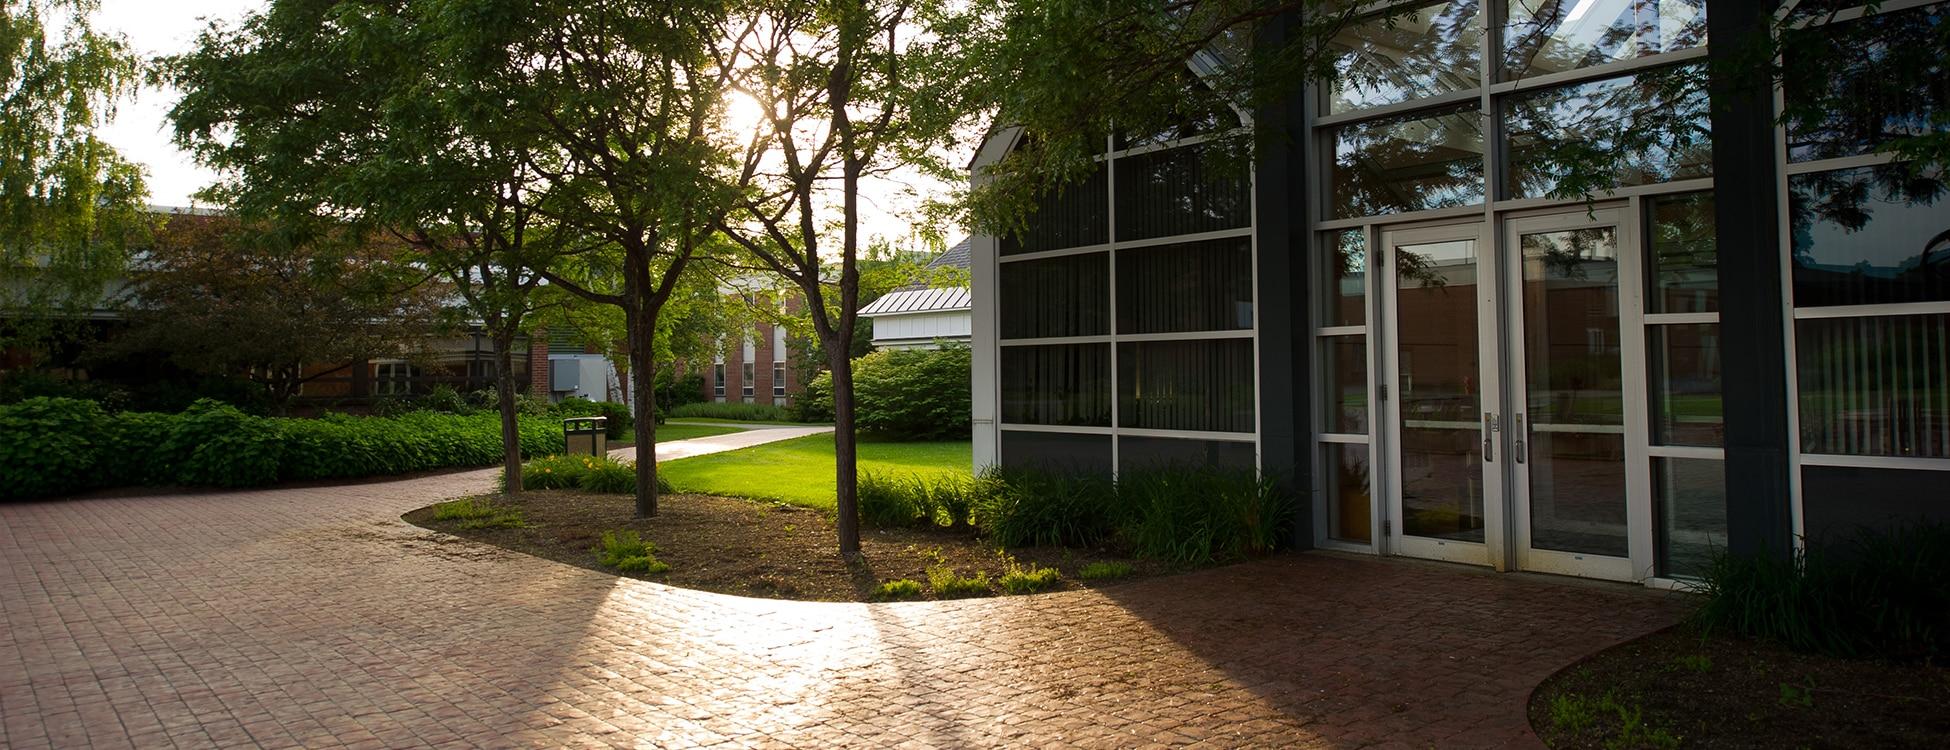 Randolph Center campus, Administration building, sunset, plaza, patio